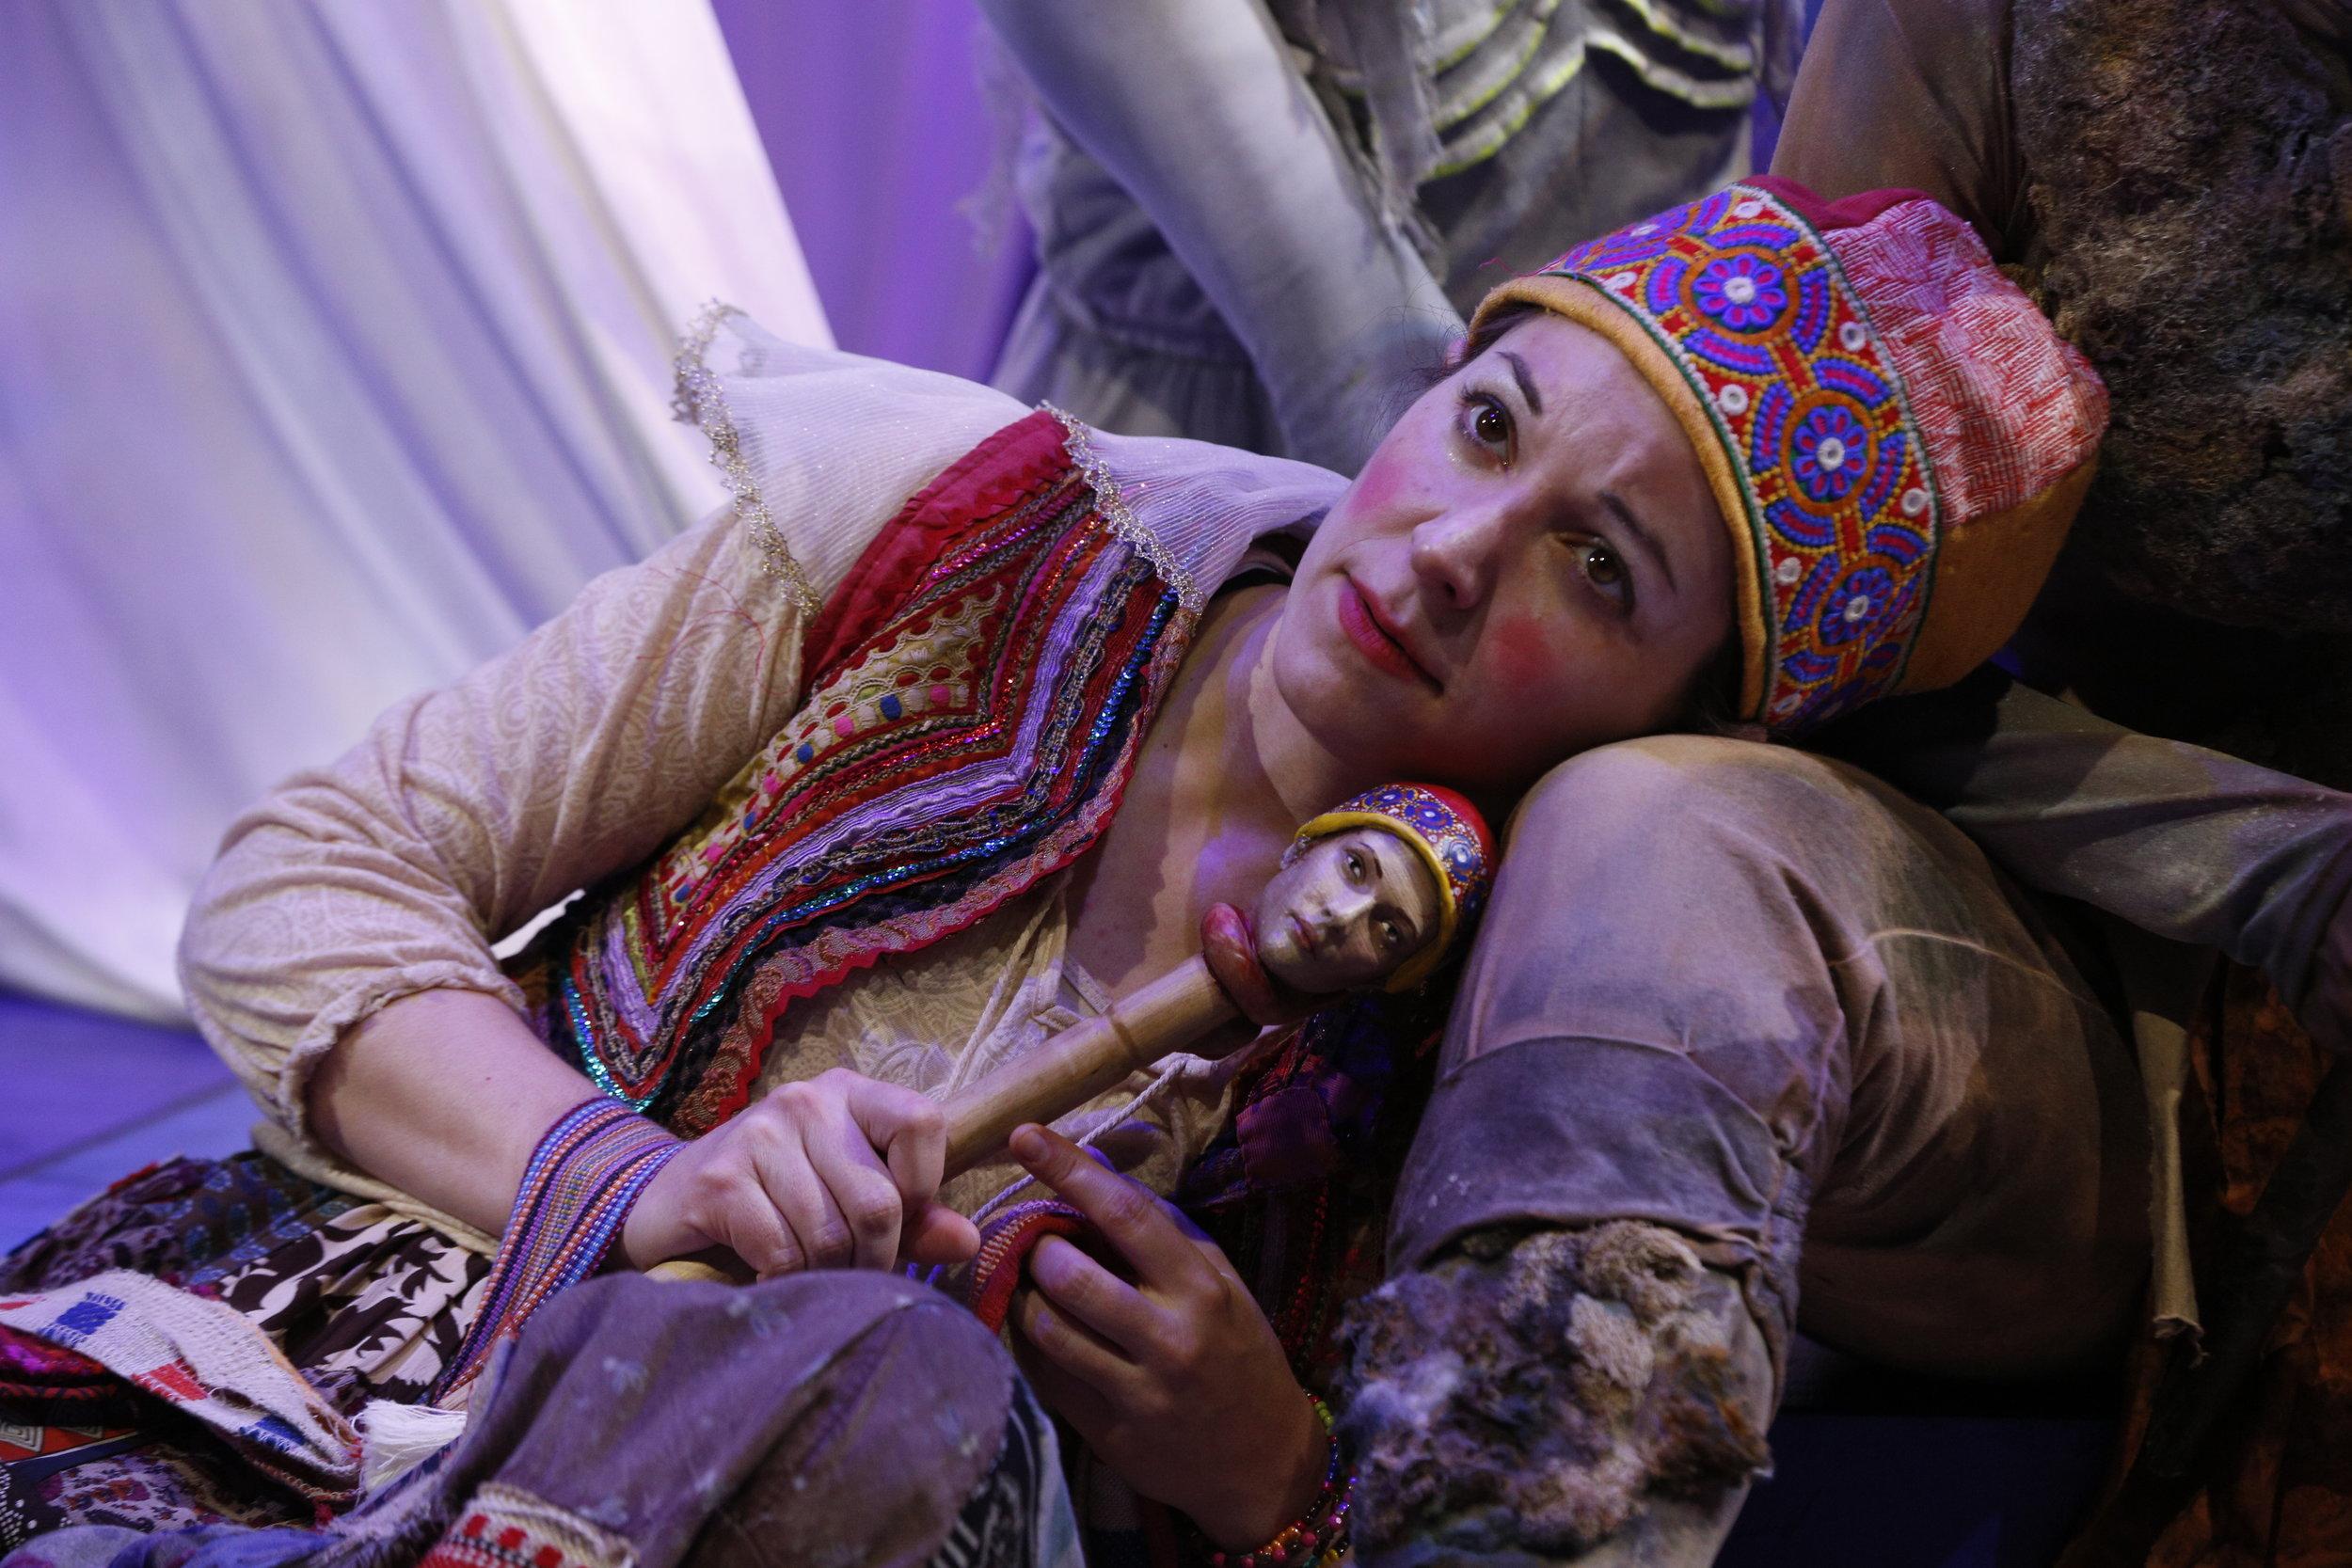 Tar Chiusano as Trinculo. Photo by:Jeremy Hogan